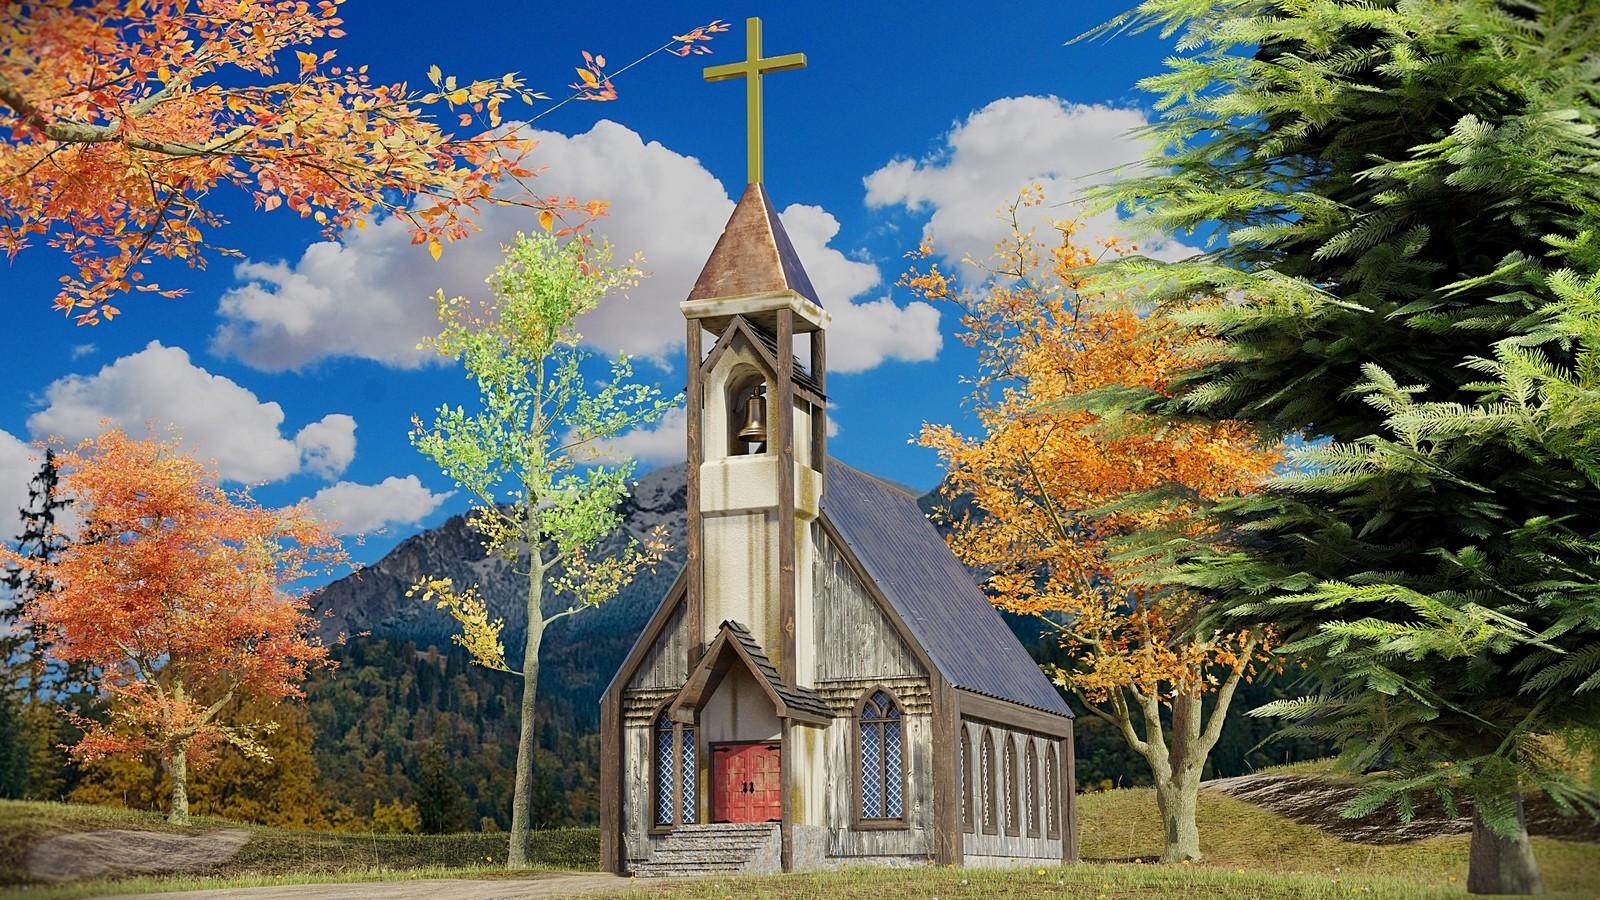 Old Country Church Scene - Realistic Tree Asset Pack (Steve Lund, CGGeek)  - Grass Essentials (Andrew Price, Blender Guru)